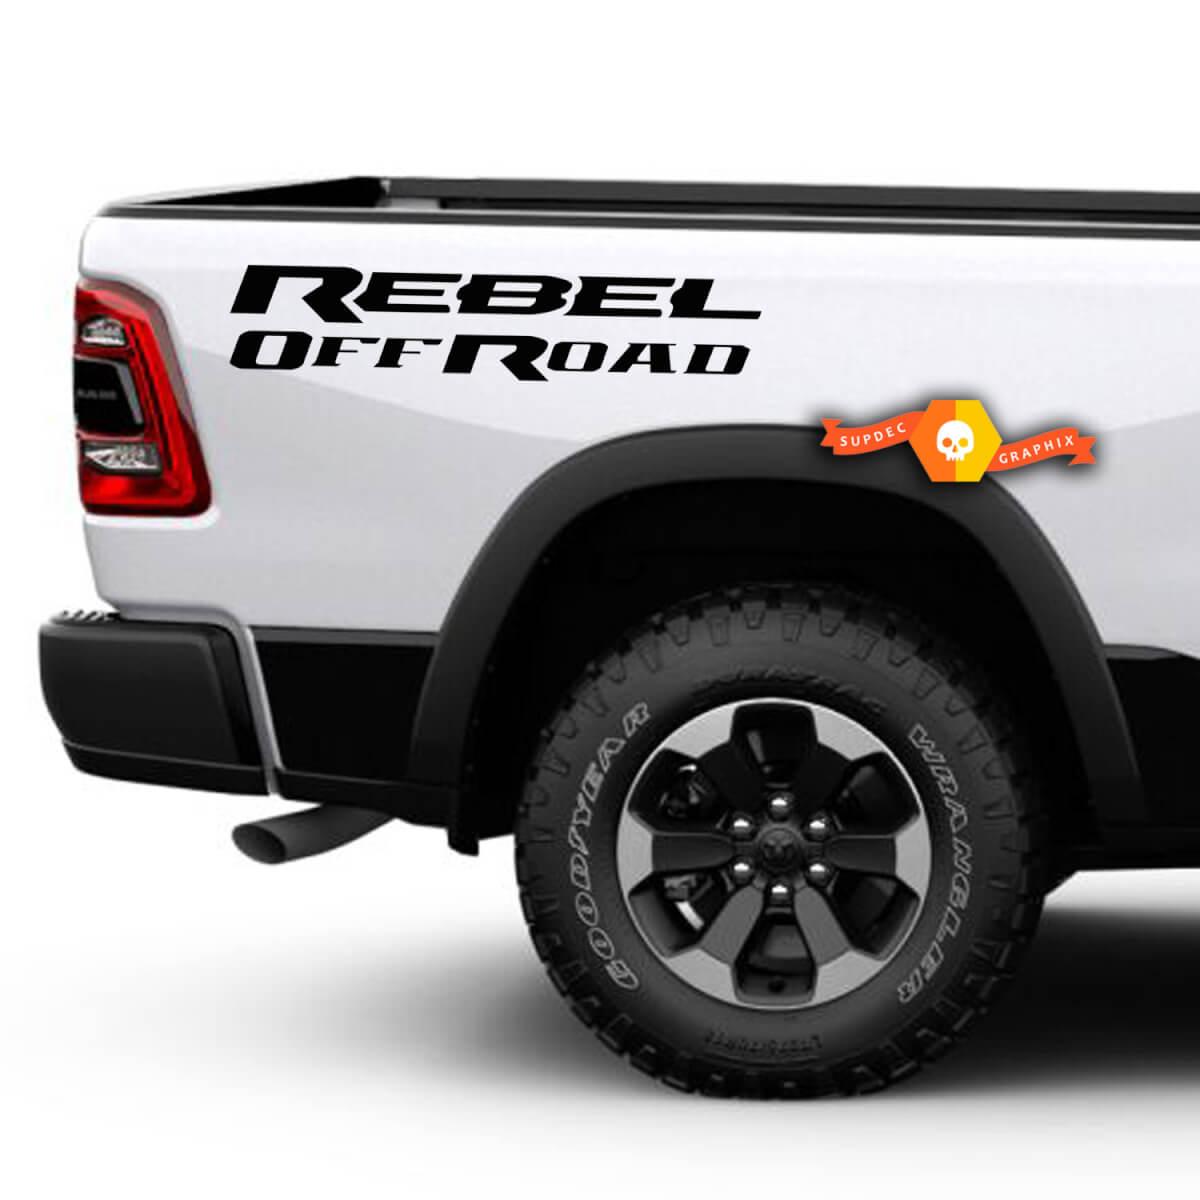 Dodge Ram Rebel Logo Seite Flare Truck Vinyl Aufkleber Grafik Off Road Bett Pickup